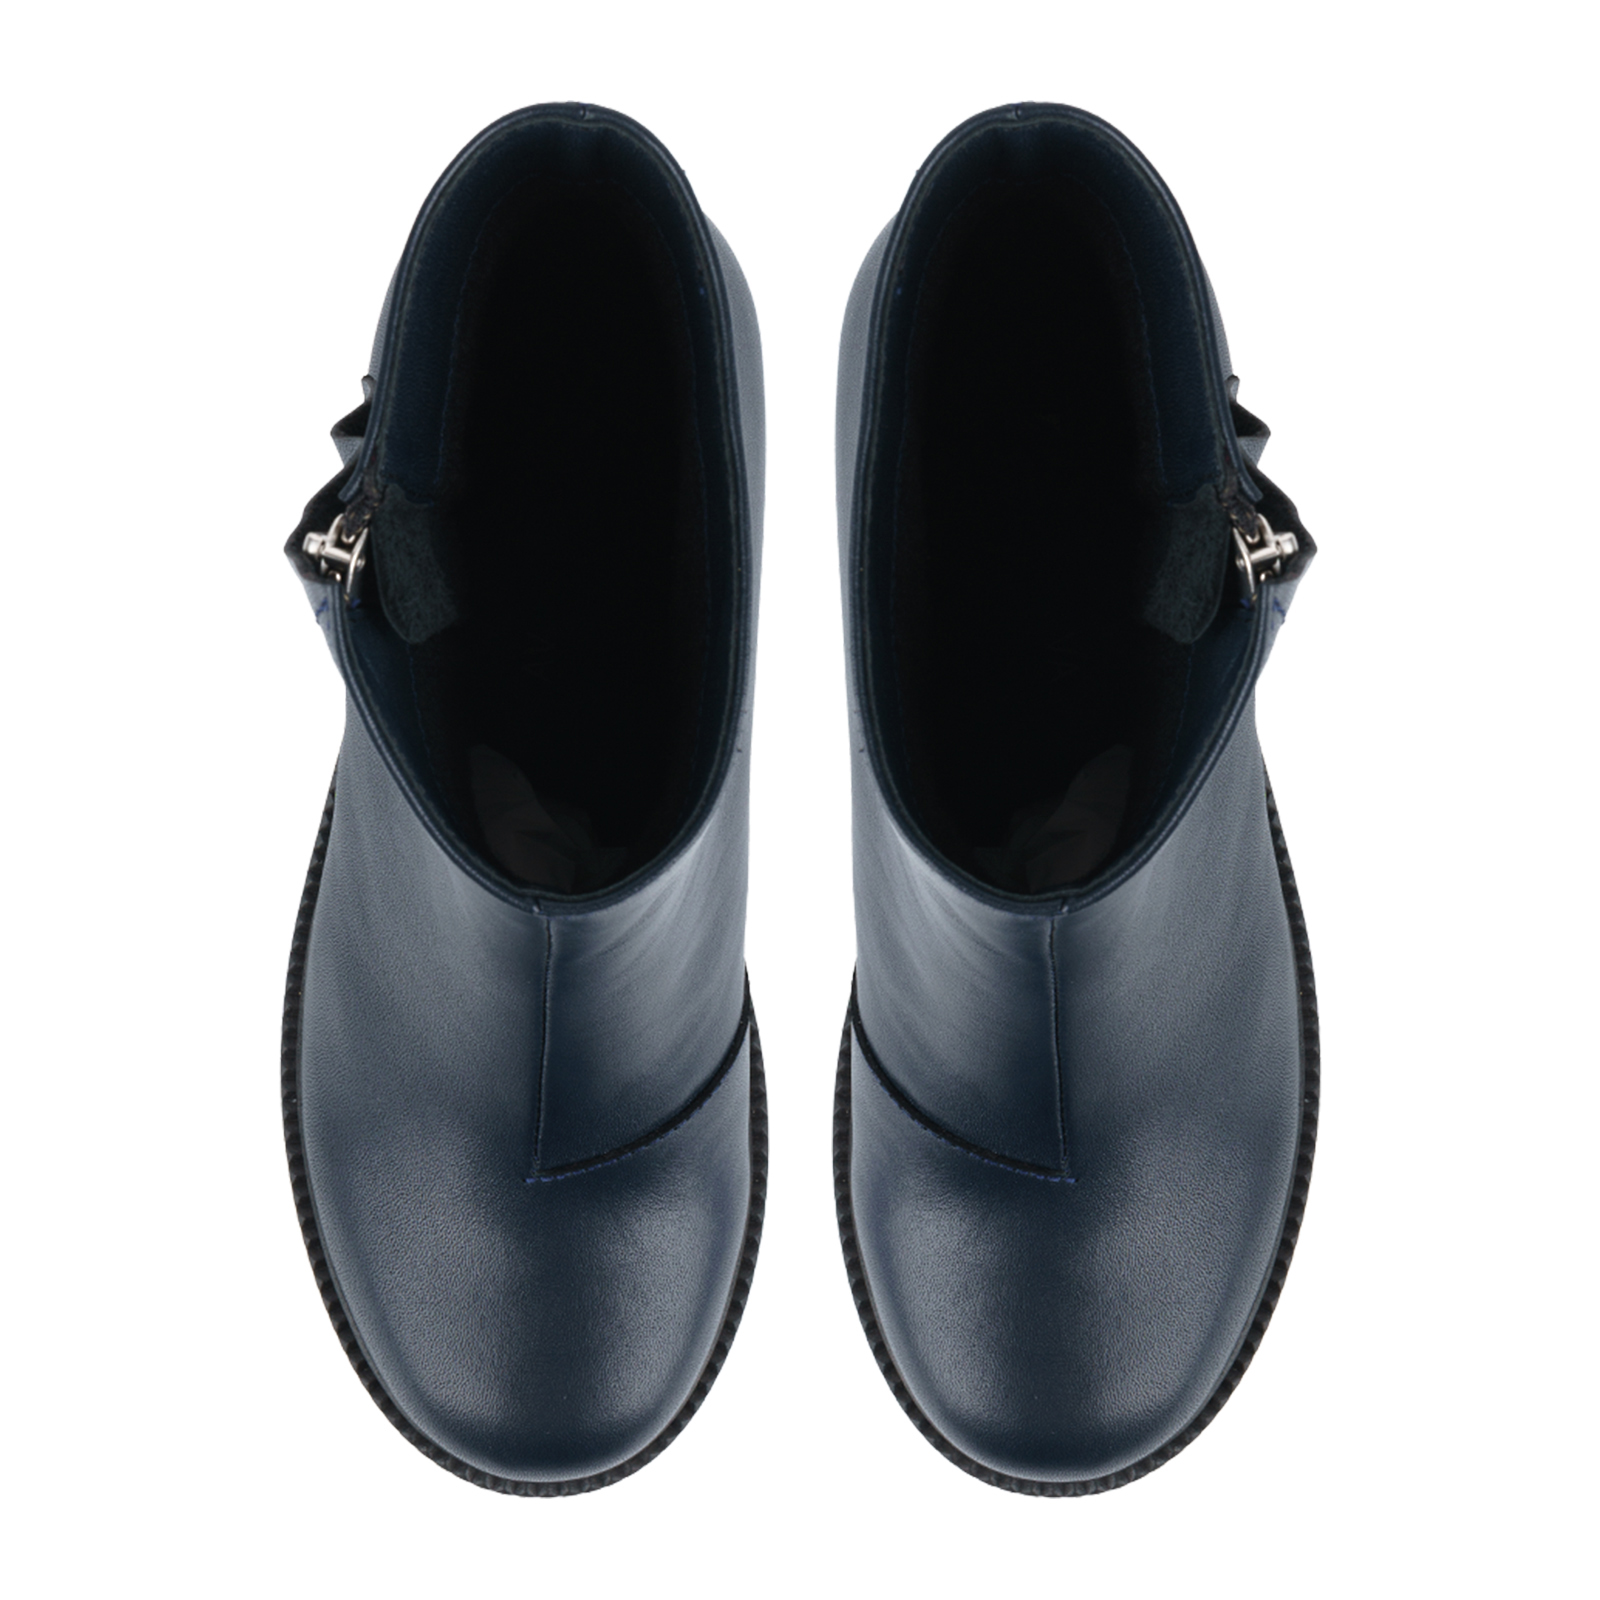 Ботинки для женщин Ботинки Молния кожа синие на байке 100178 цена, 2017